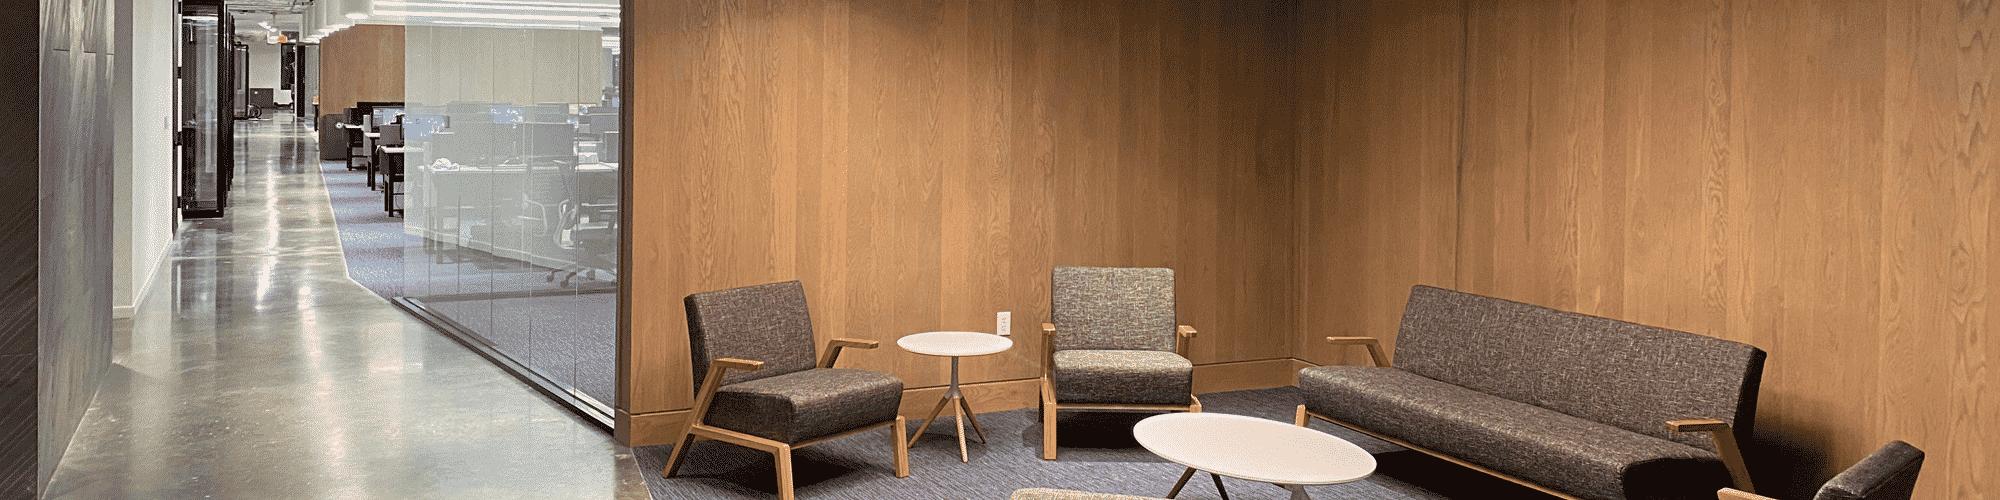 East-6-Sublease-Interior   East Austin Office